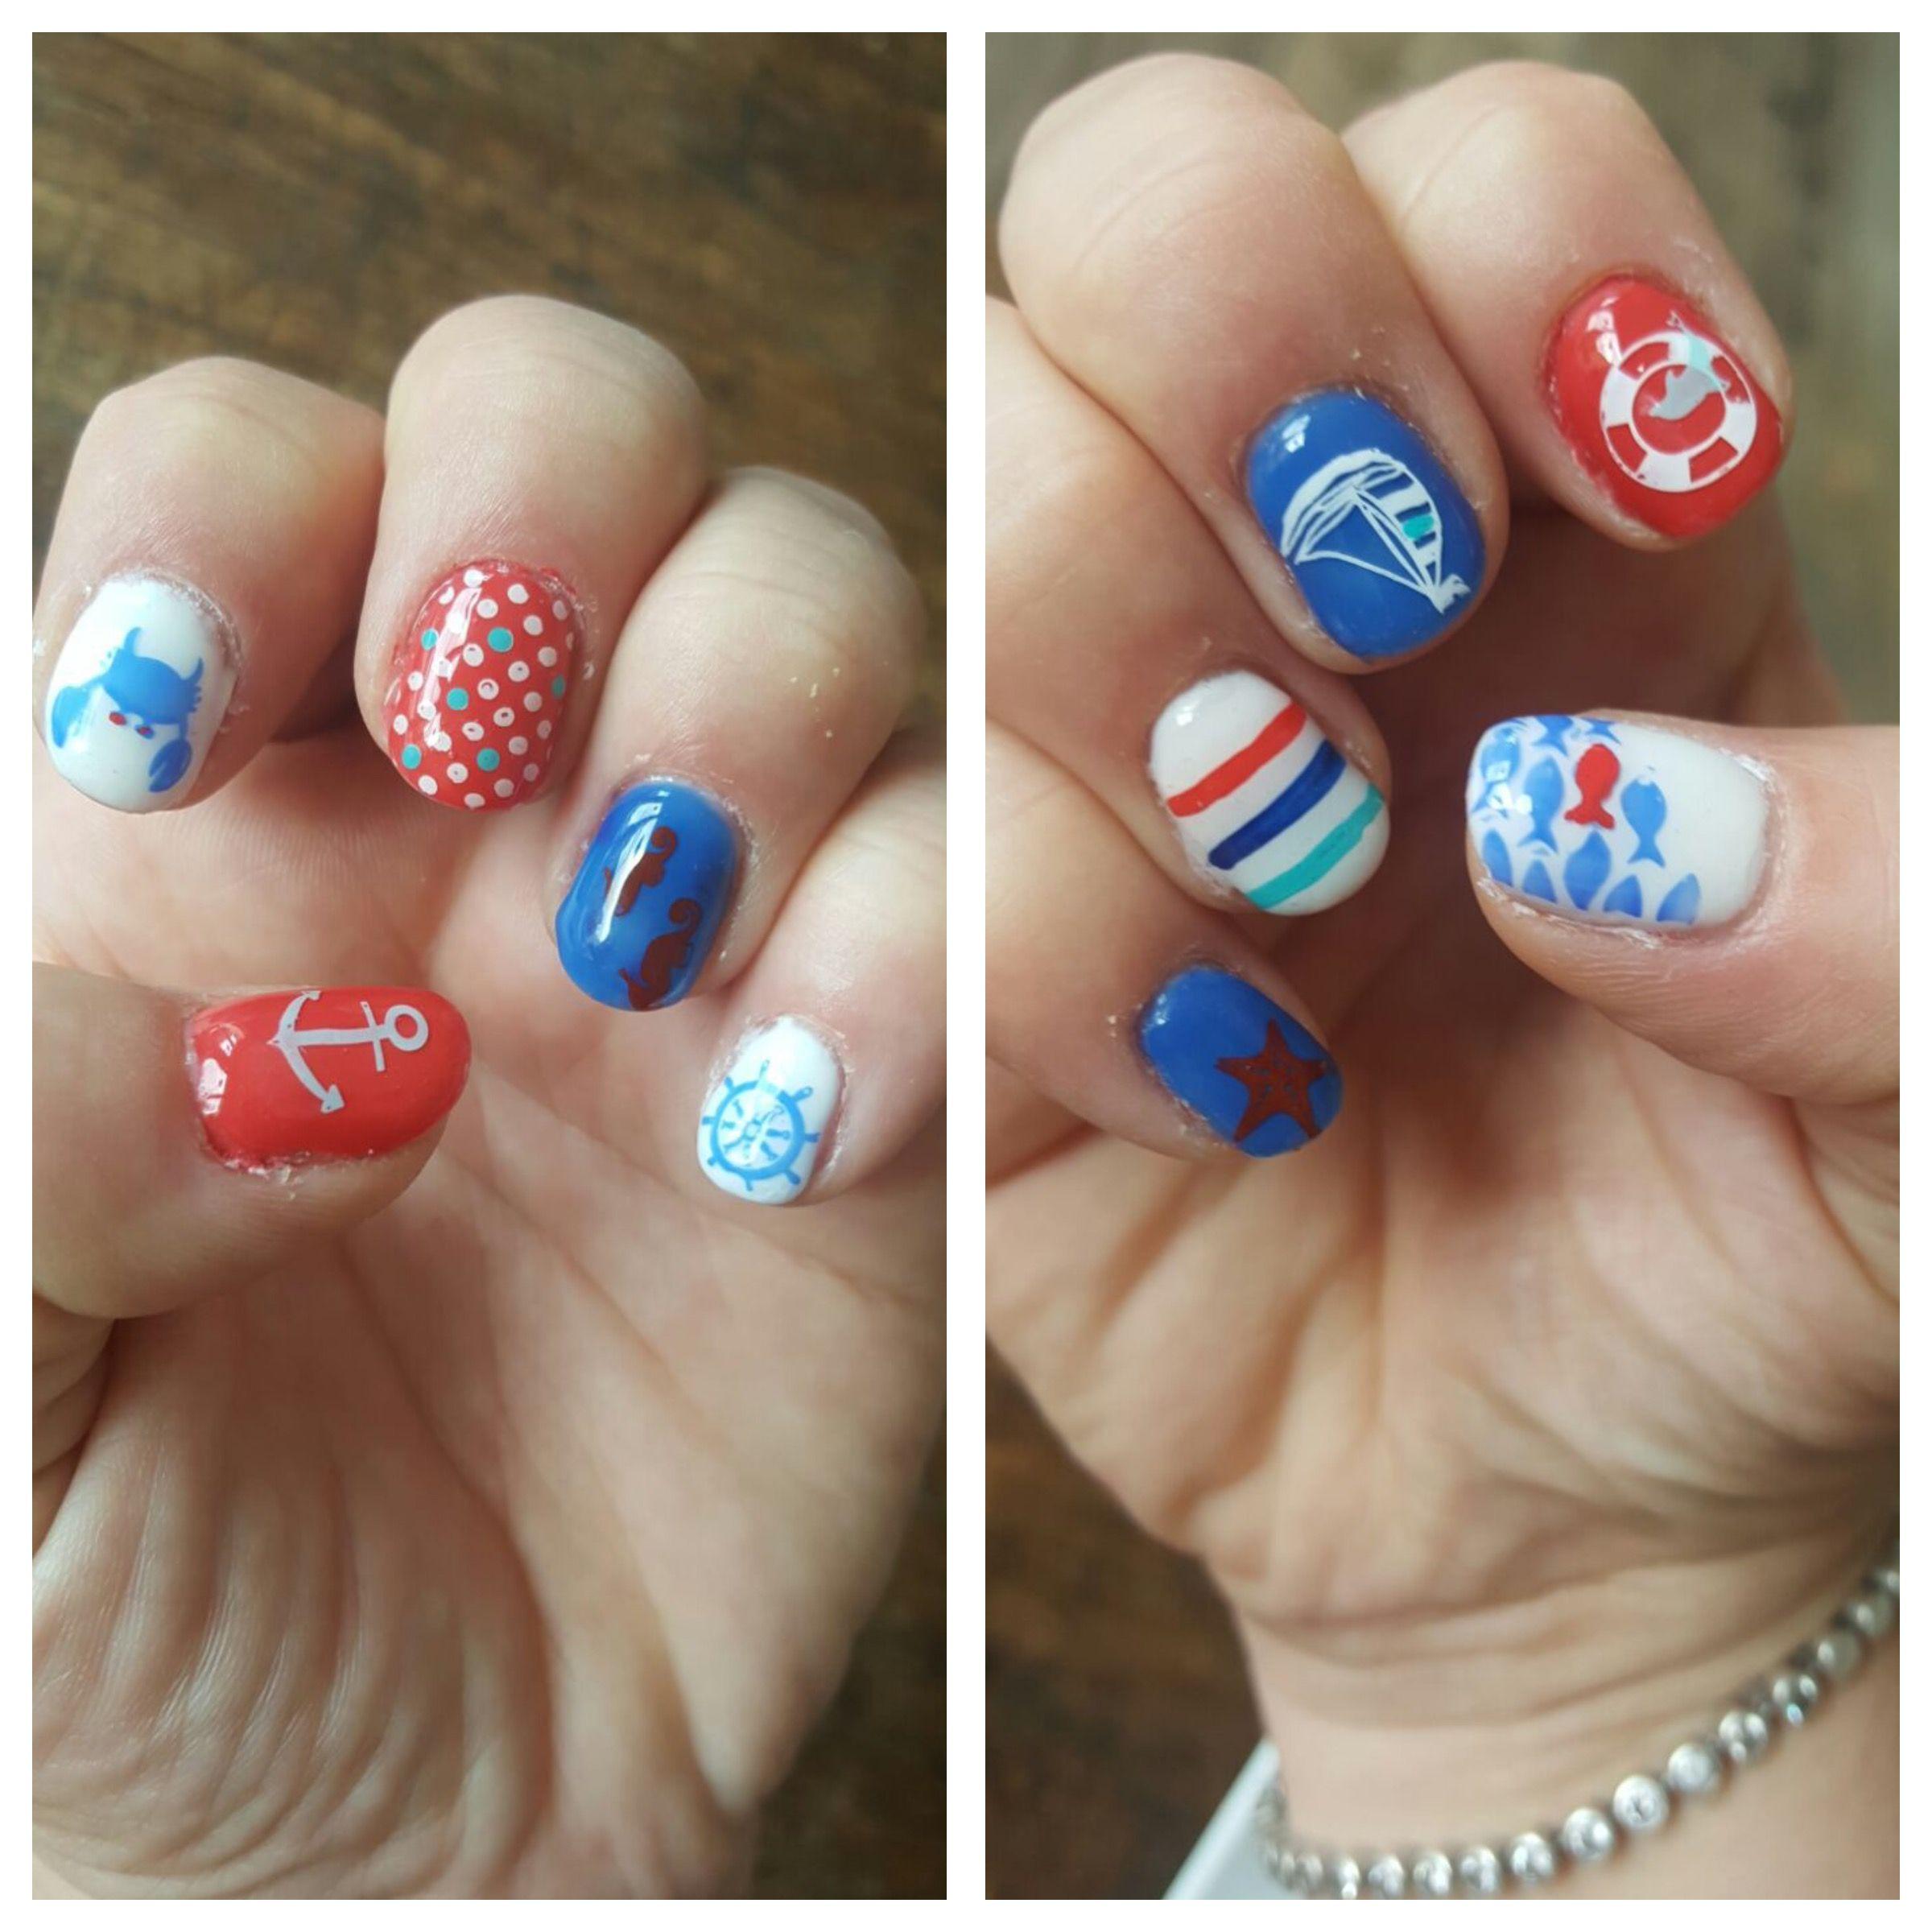 Nails - Nageldesign Urlaub Kreuzfahrt | Nageldesign | Pinterest ...